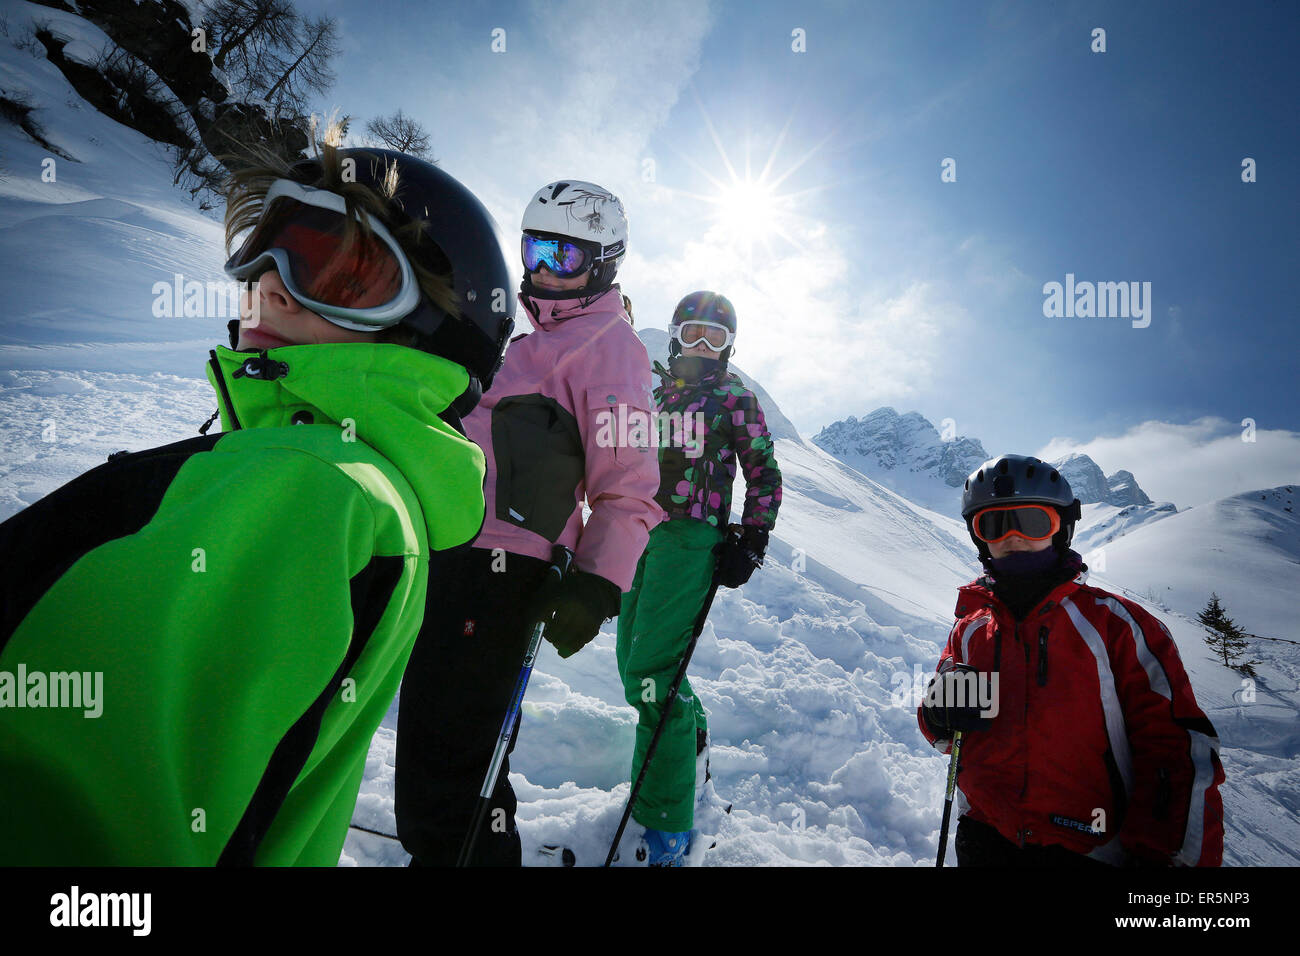 Four children wearing skiwear in snow, ski resort Ladurns, Gossensass, South Tyrol, Italy - Stock Image